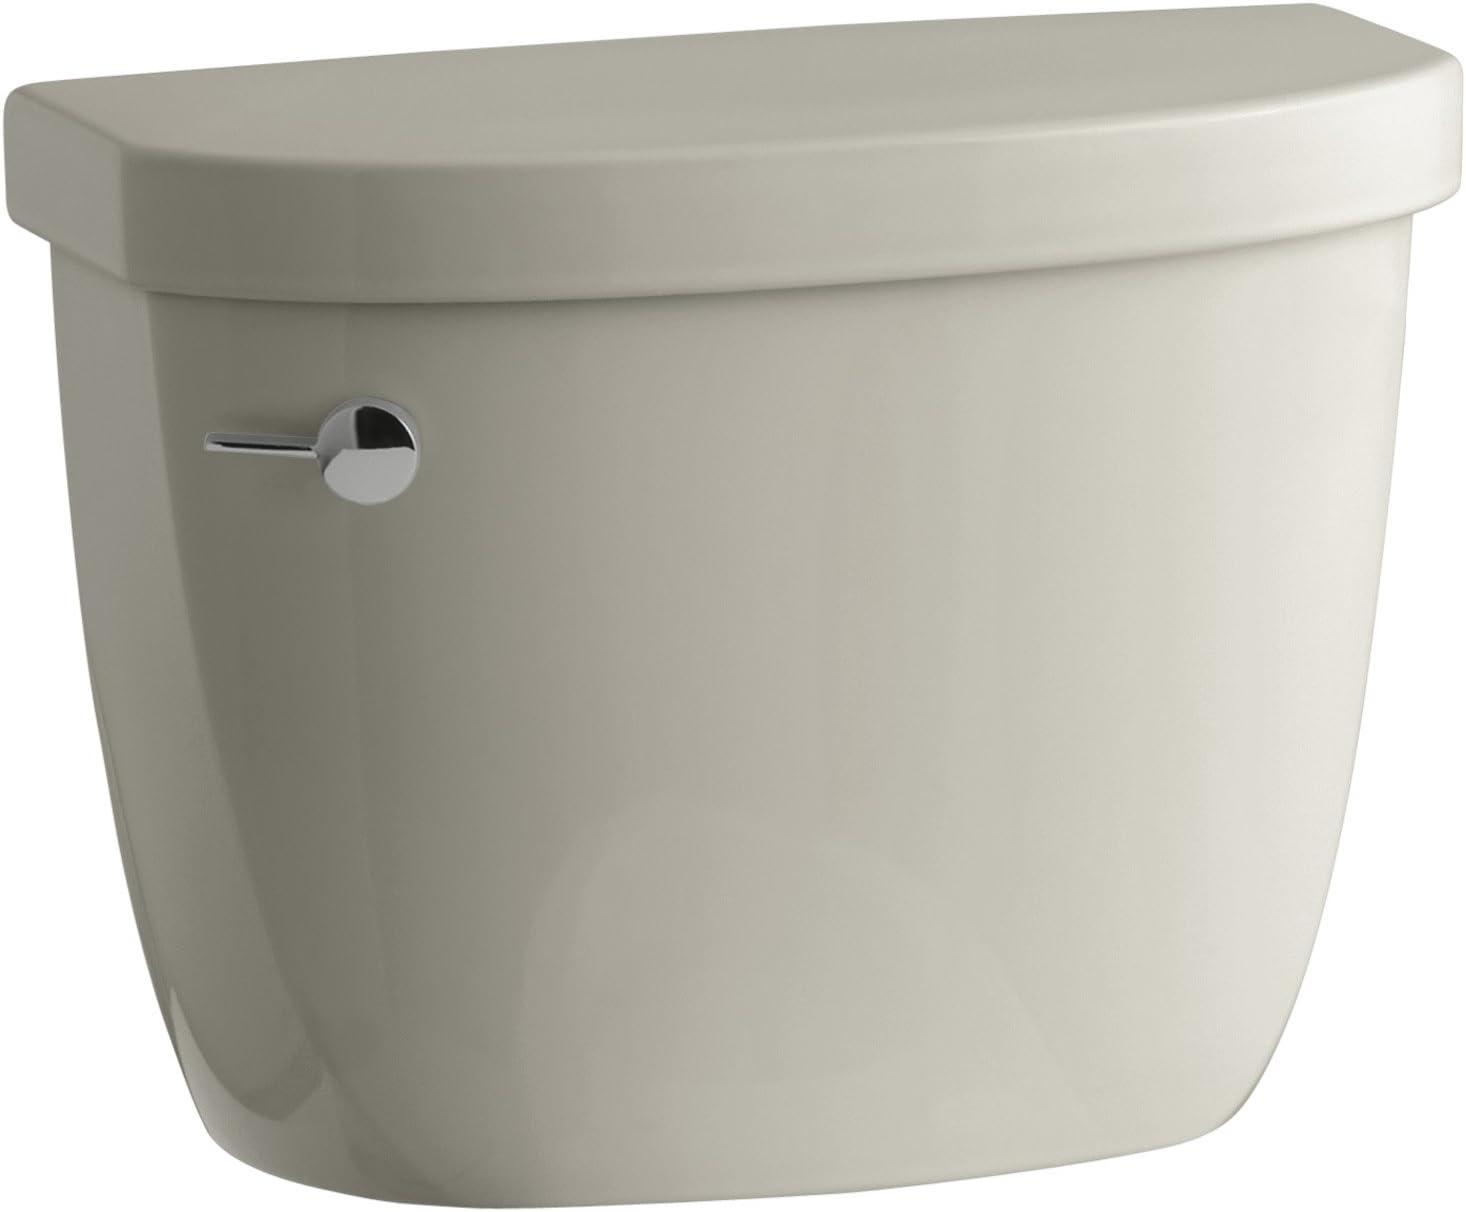 High quality Kohler K-4421-G9 Industry No. 1 Cimarron 1.28 gpf Toilet Tank Six Sandba Class